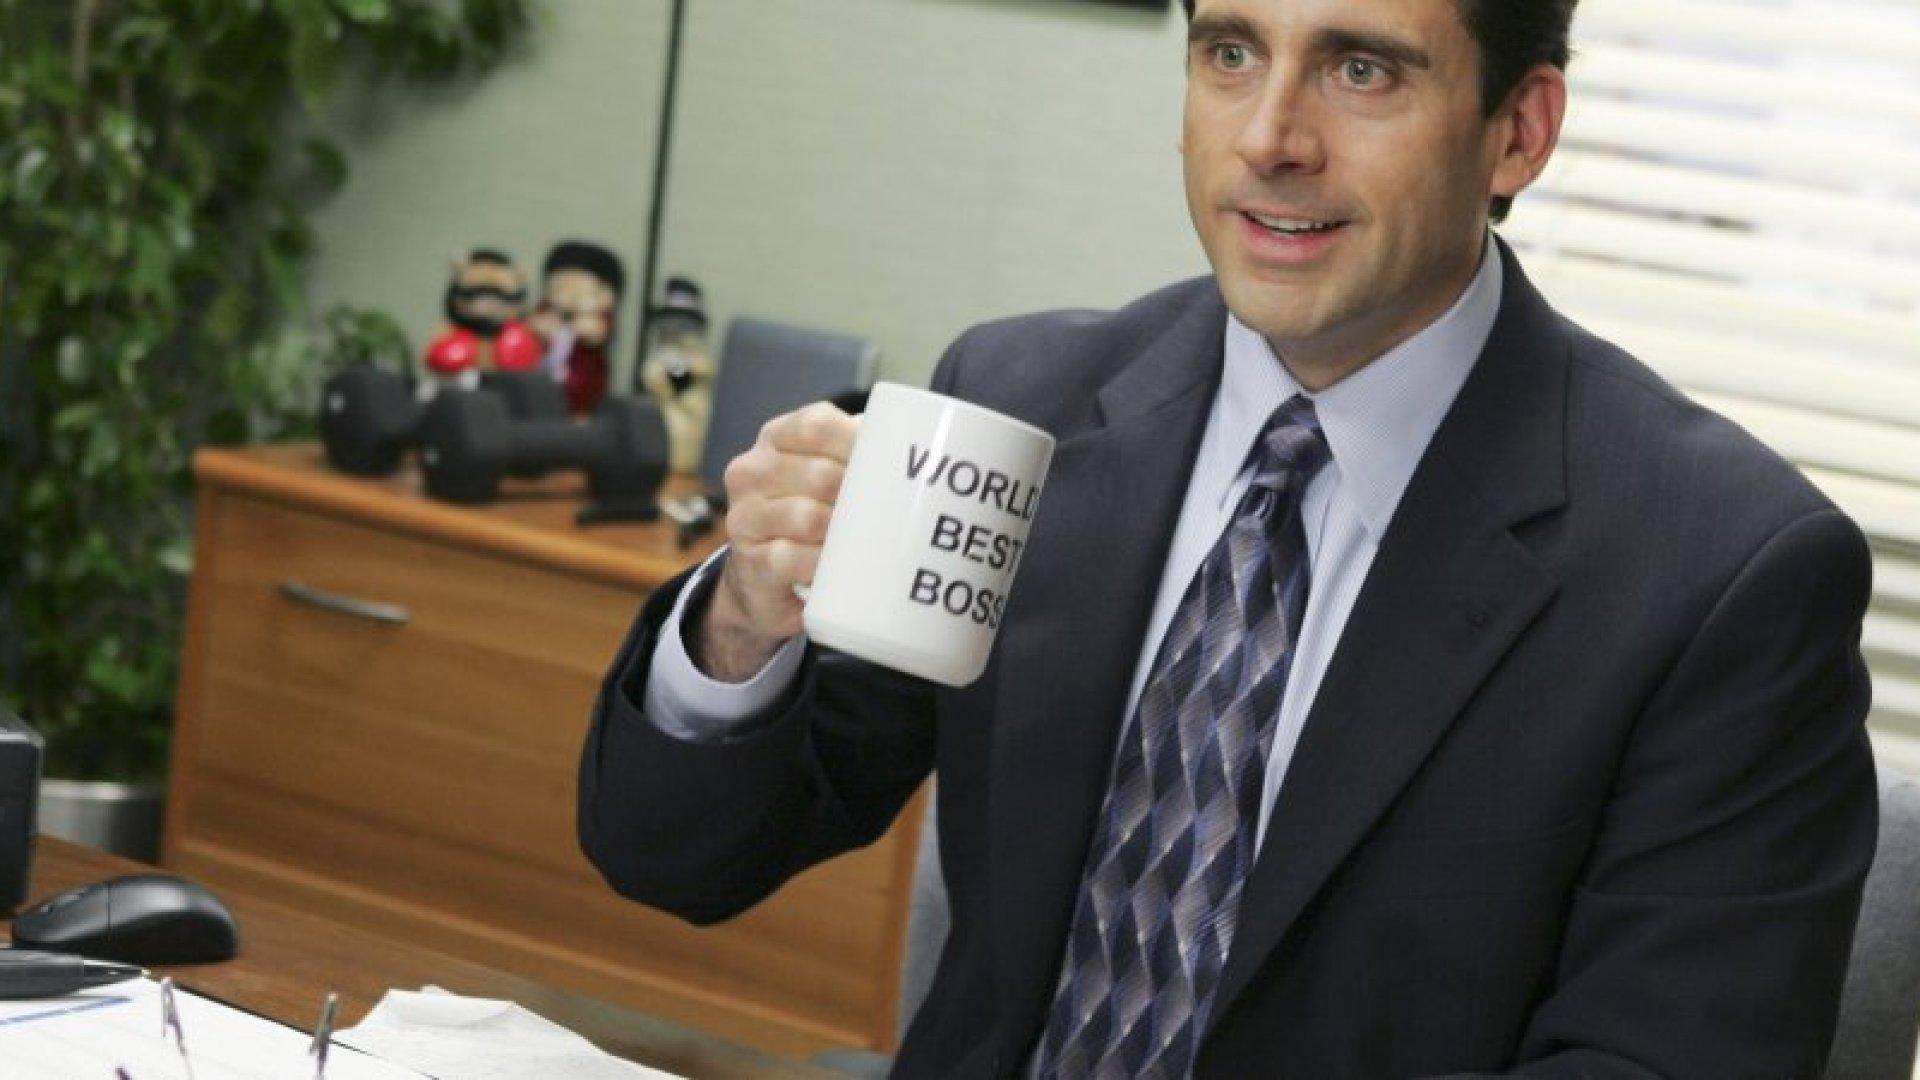 Top 10 Dumb-Boss Stories